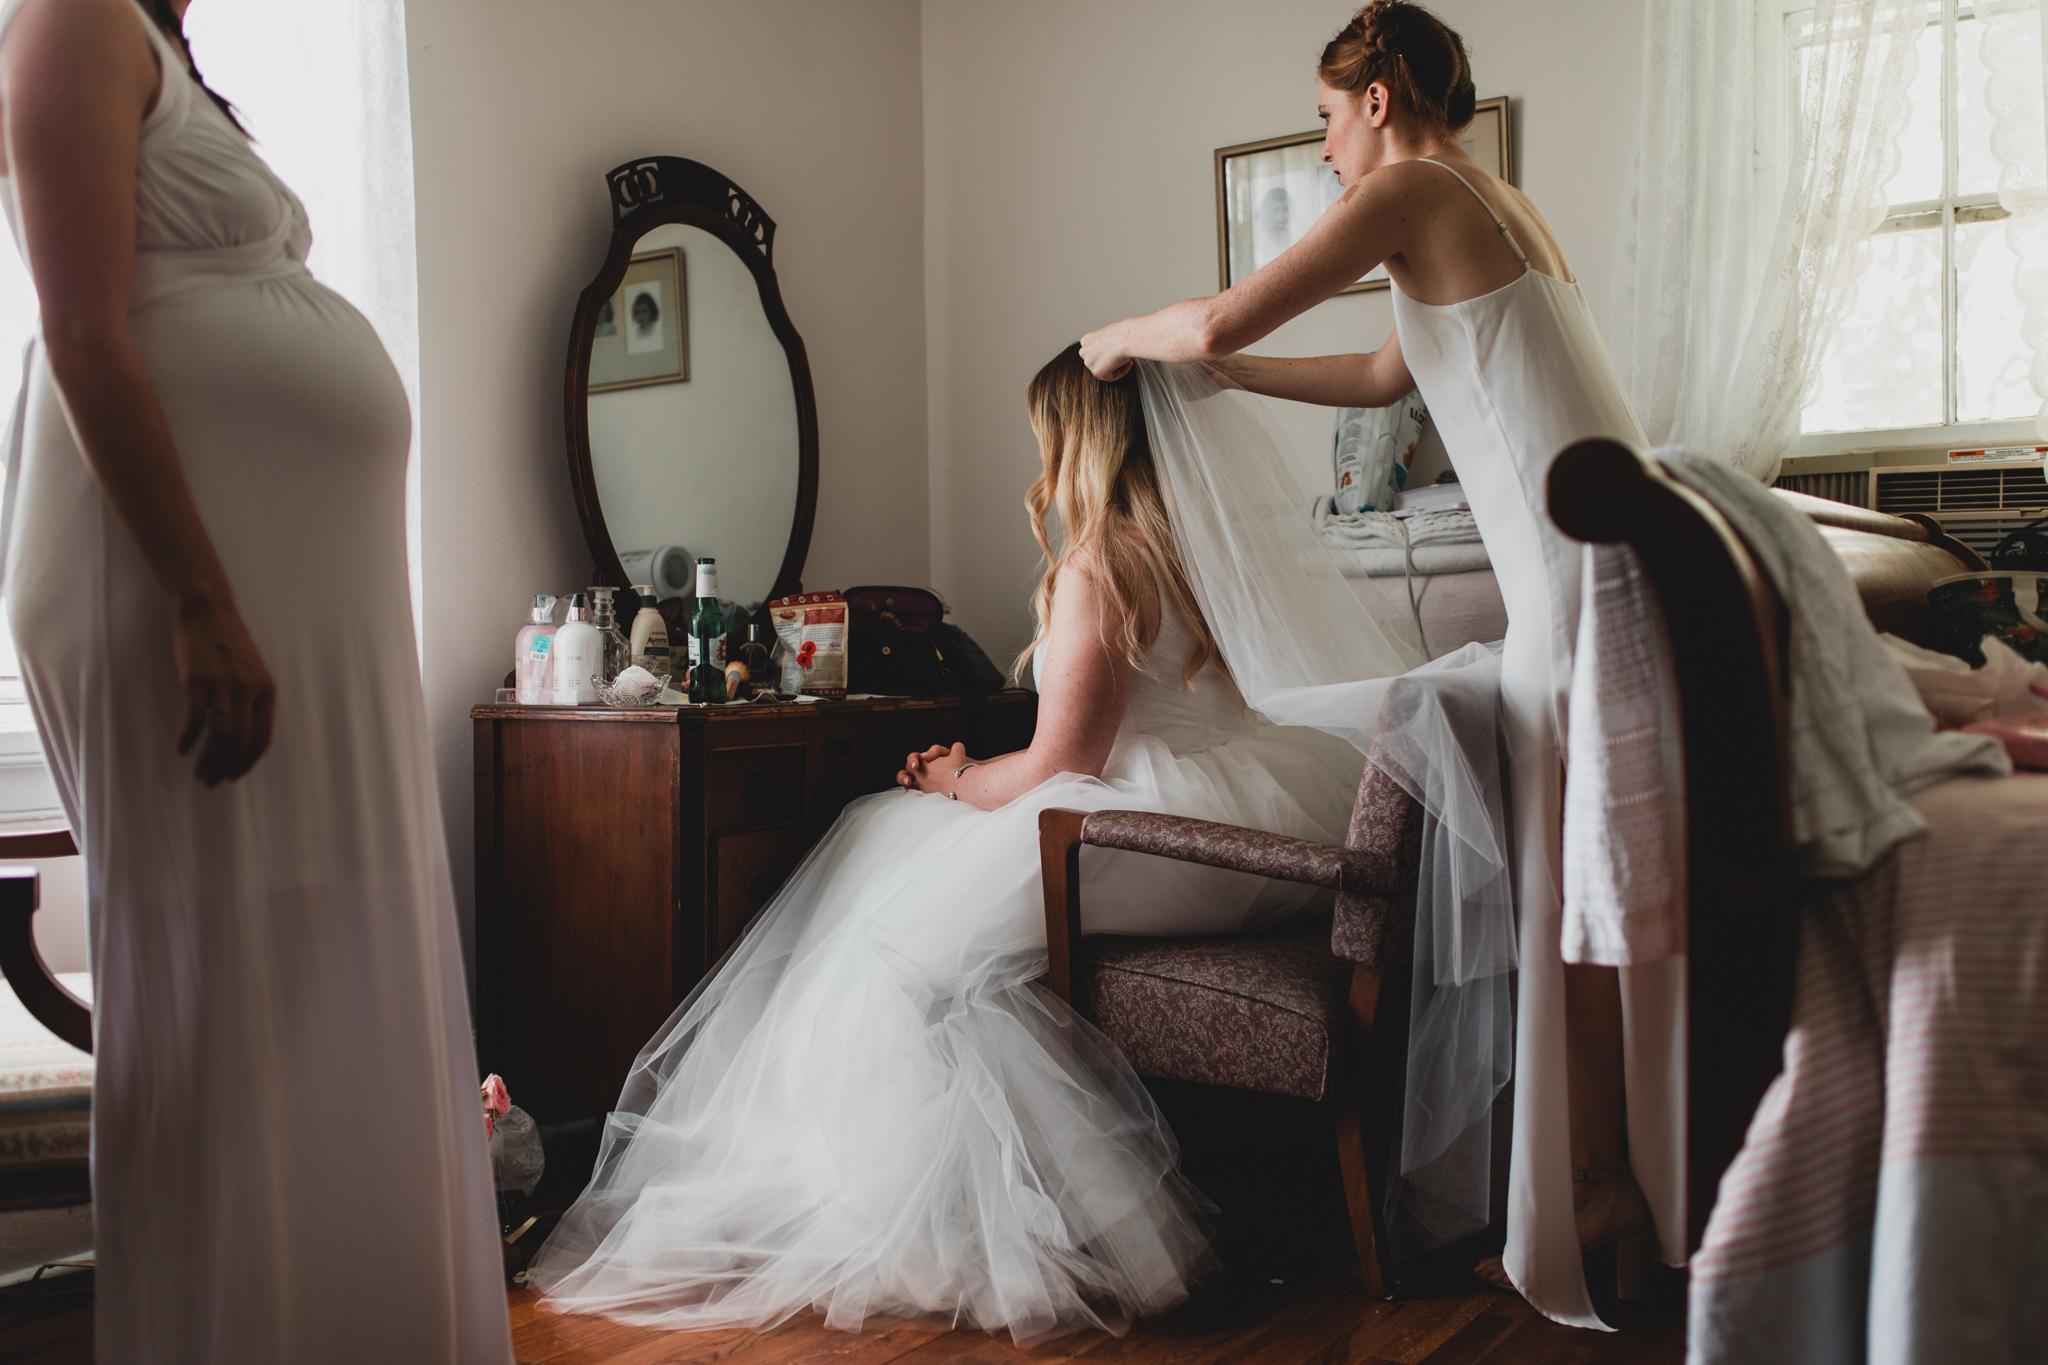 Full Day Wedding Coverage Ottawa